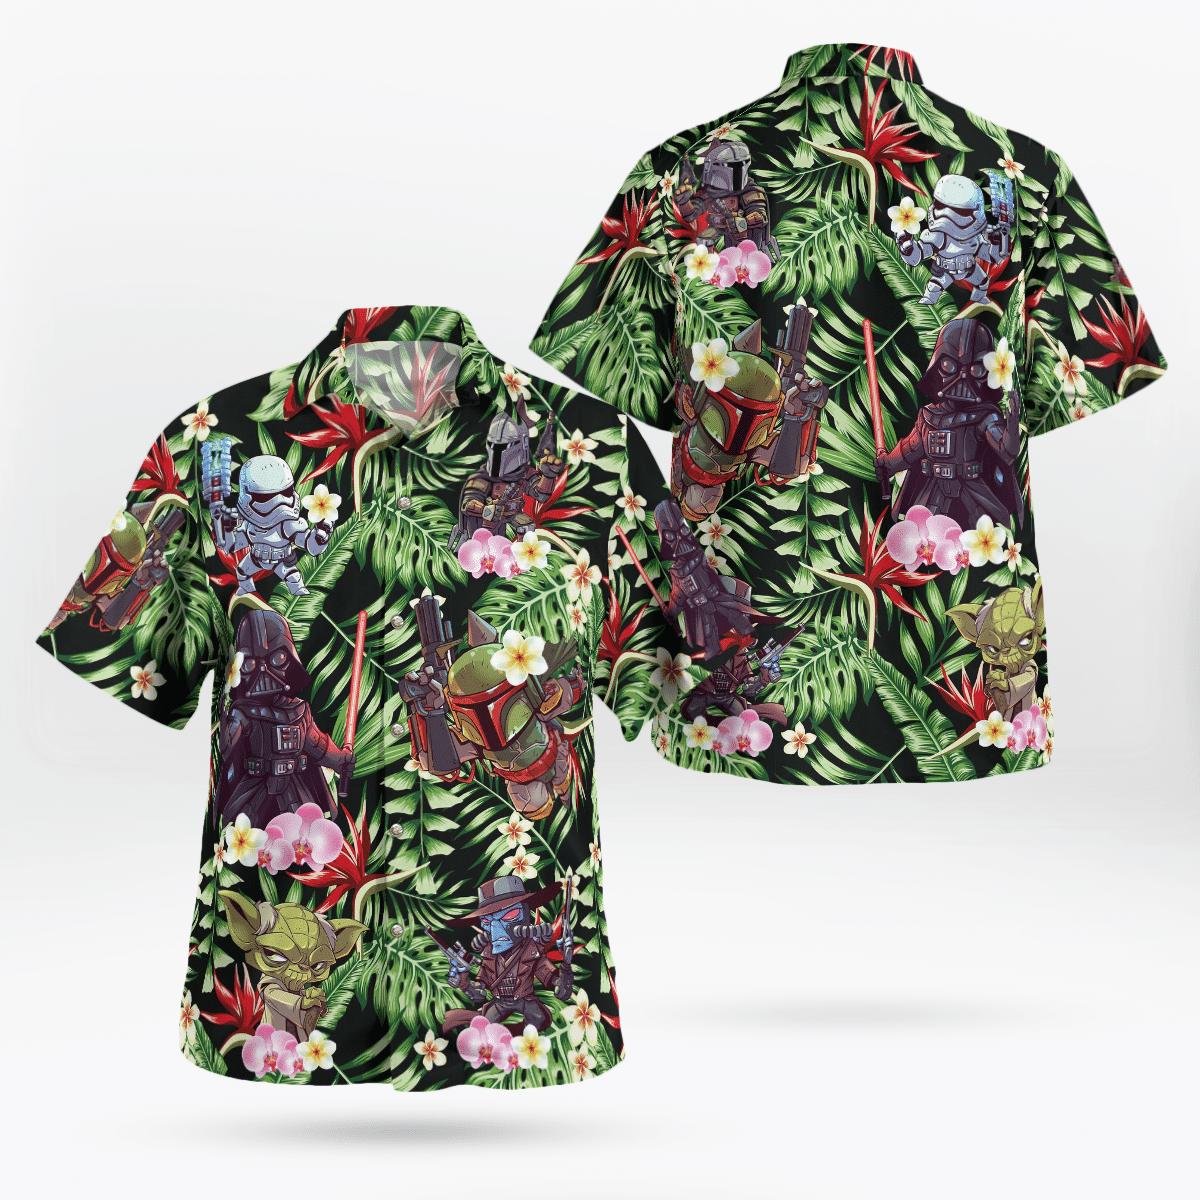 Star wars Mini Characters Floral Hawaiian Shirt